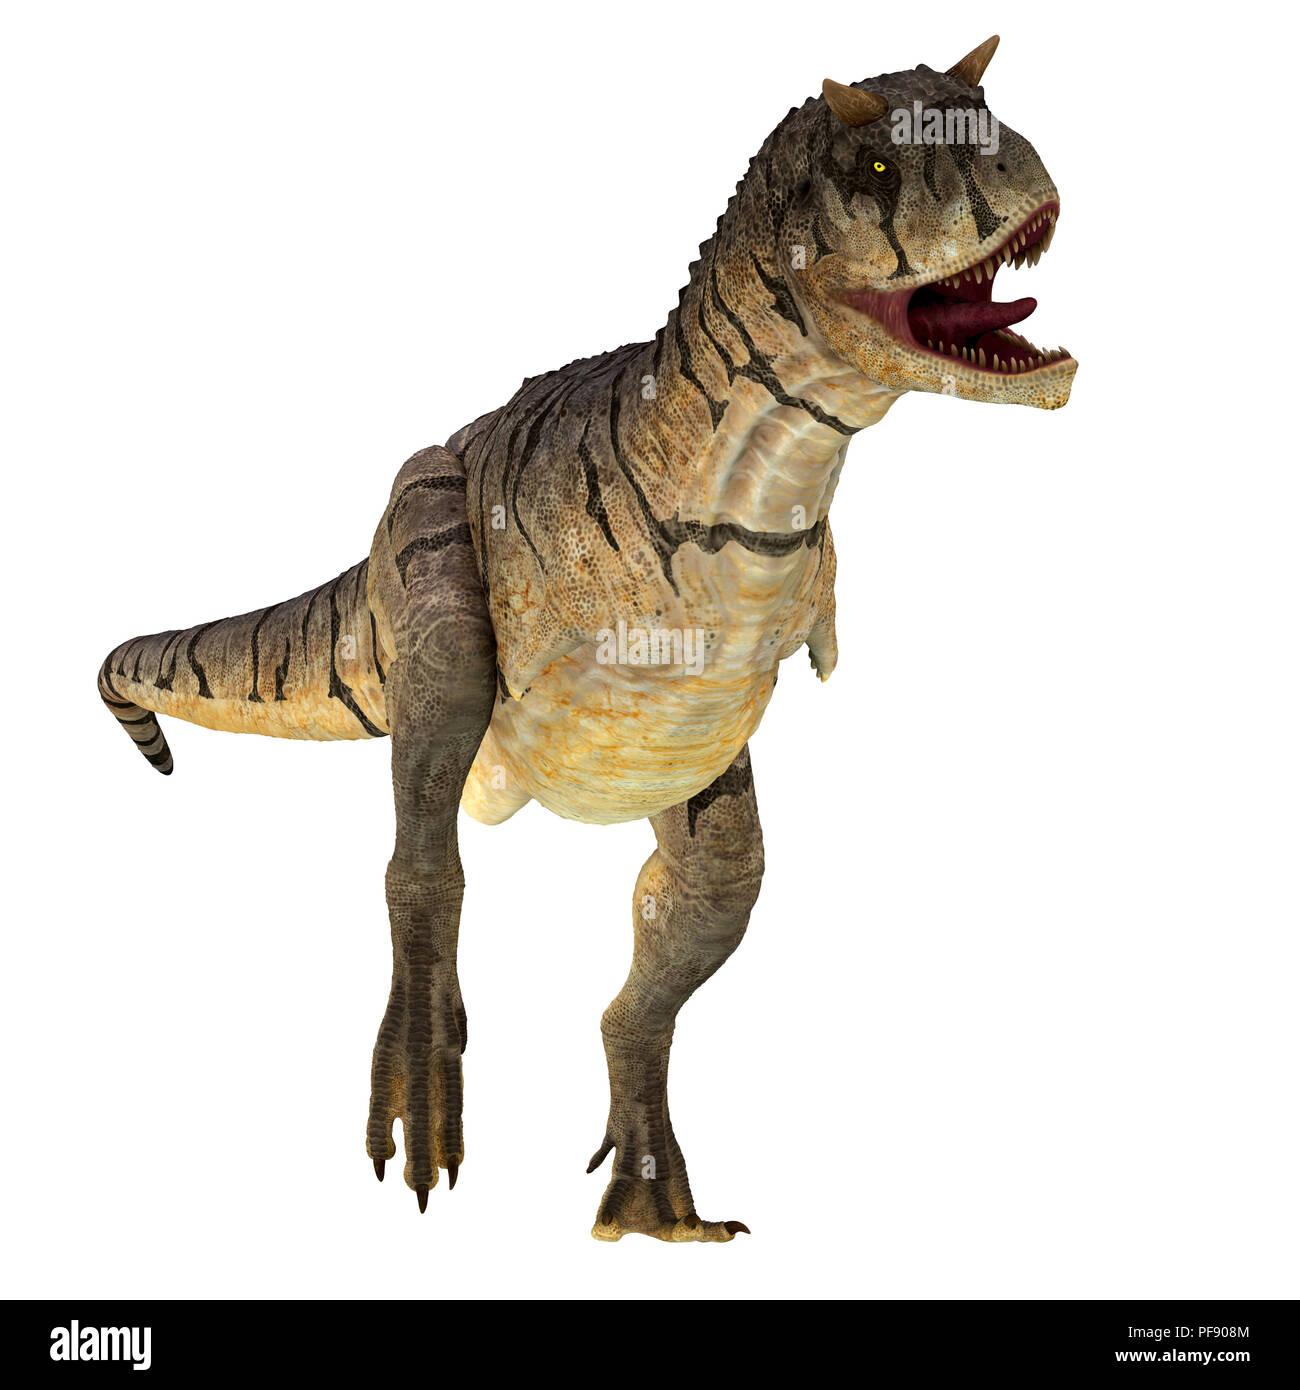 Carnotaurus sastrei Dinosaur - Carnotaurus was a carnivorous theropod dinosaur that lived in Patagonia, Argentina during the Cretaceous Period. - Stock Image